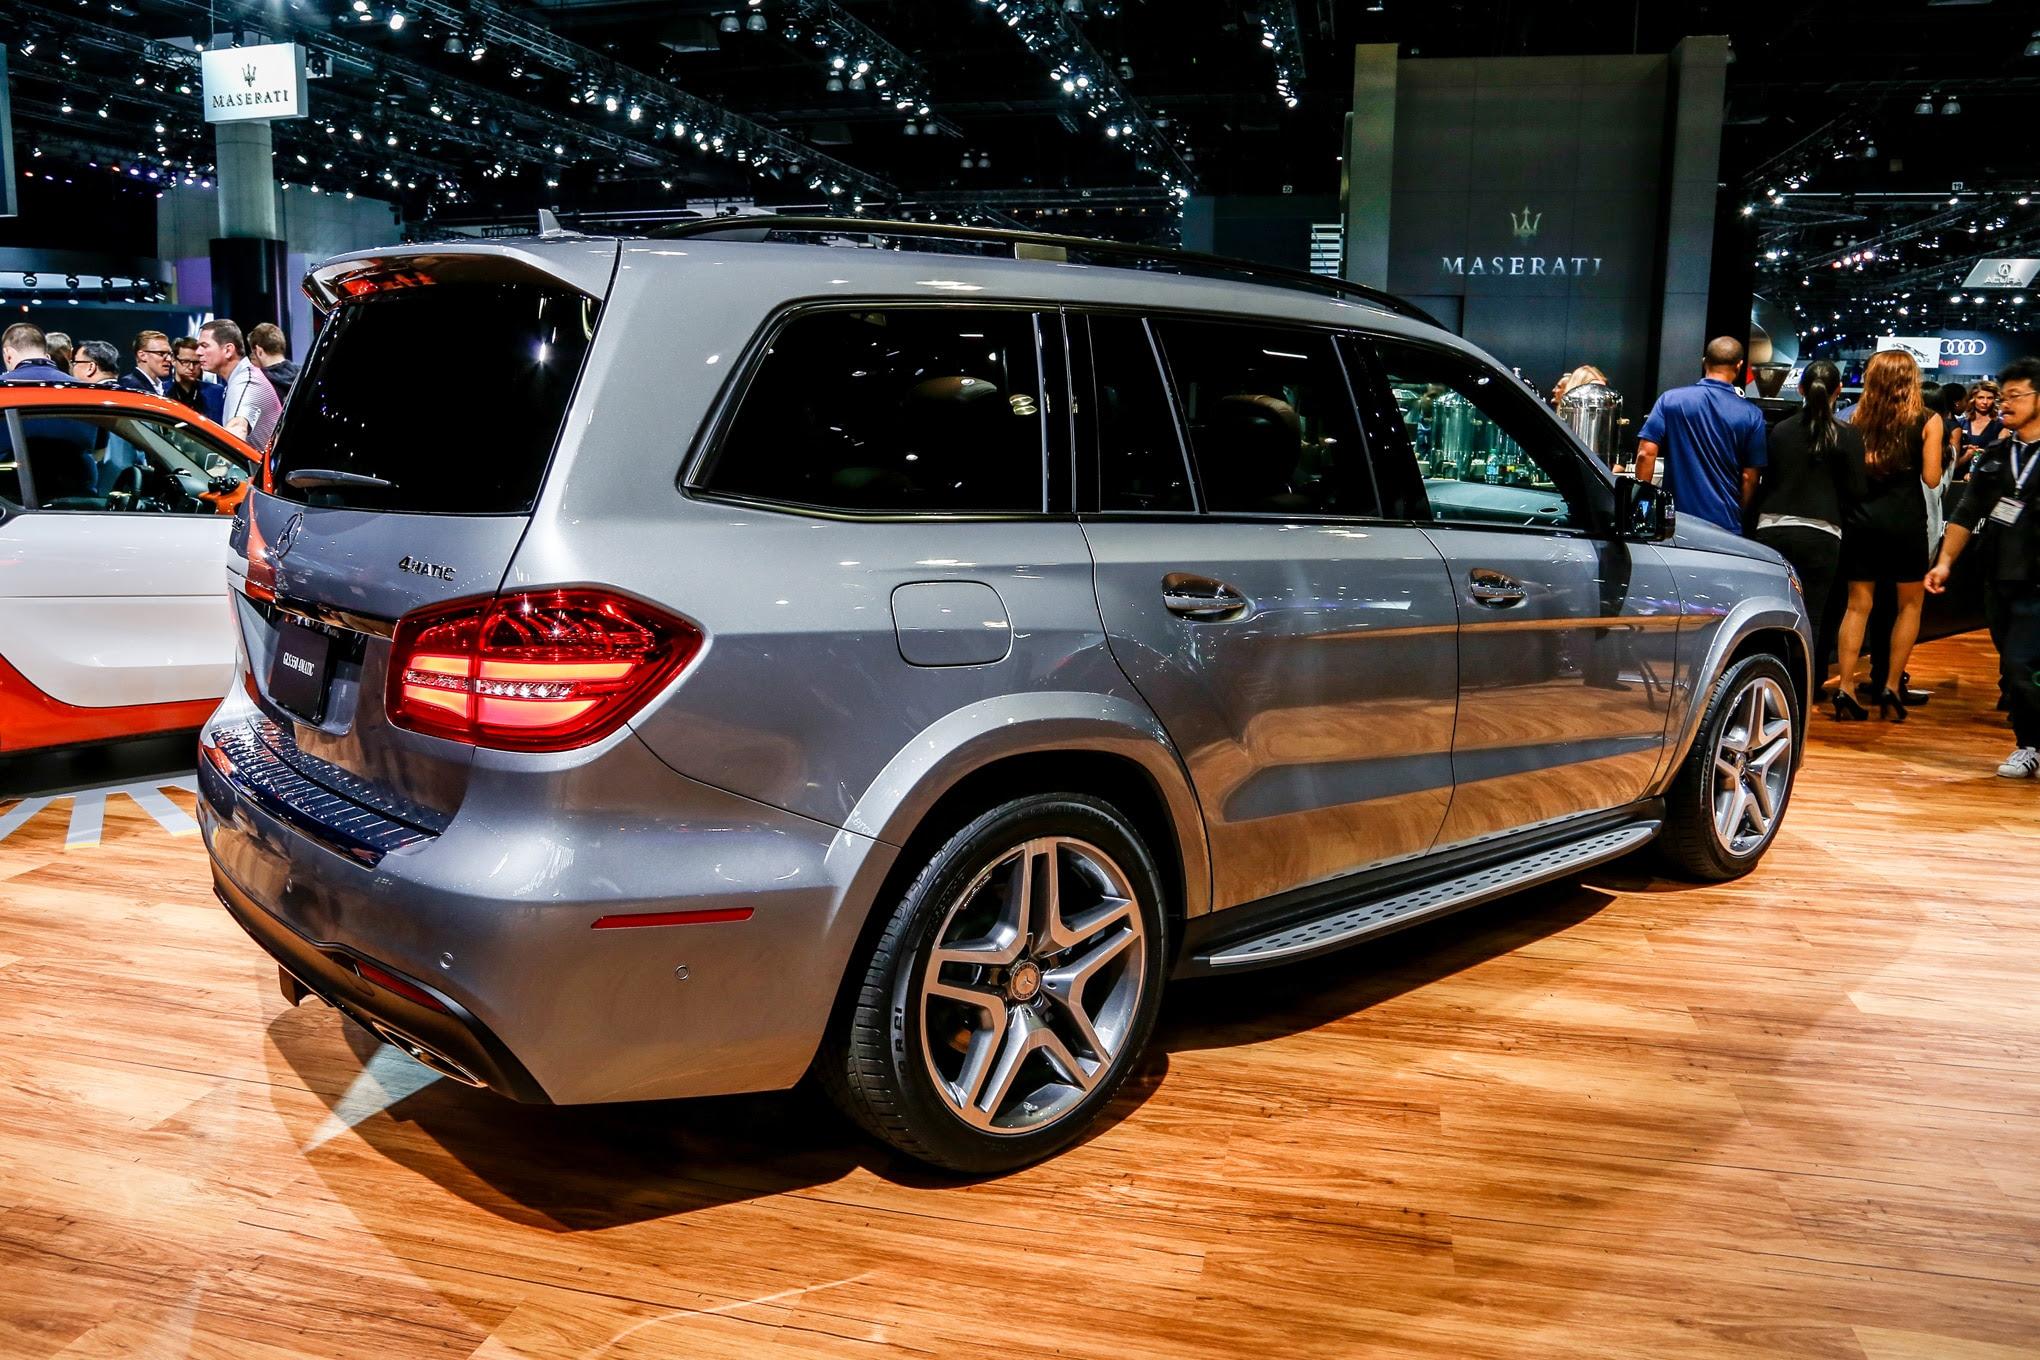 2017 Mercedes-Benz GLS Replaces GL, Adds Nine-Speed ...